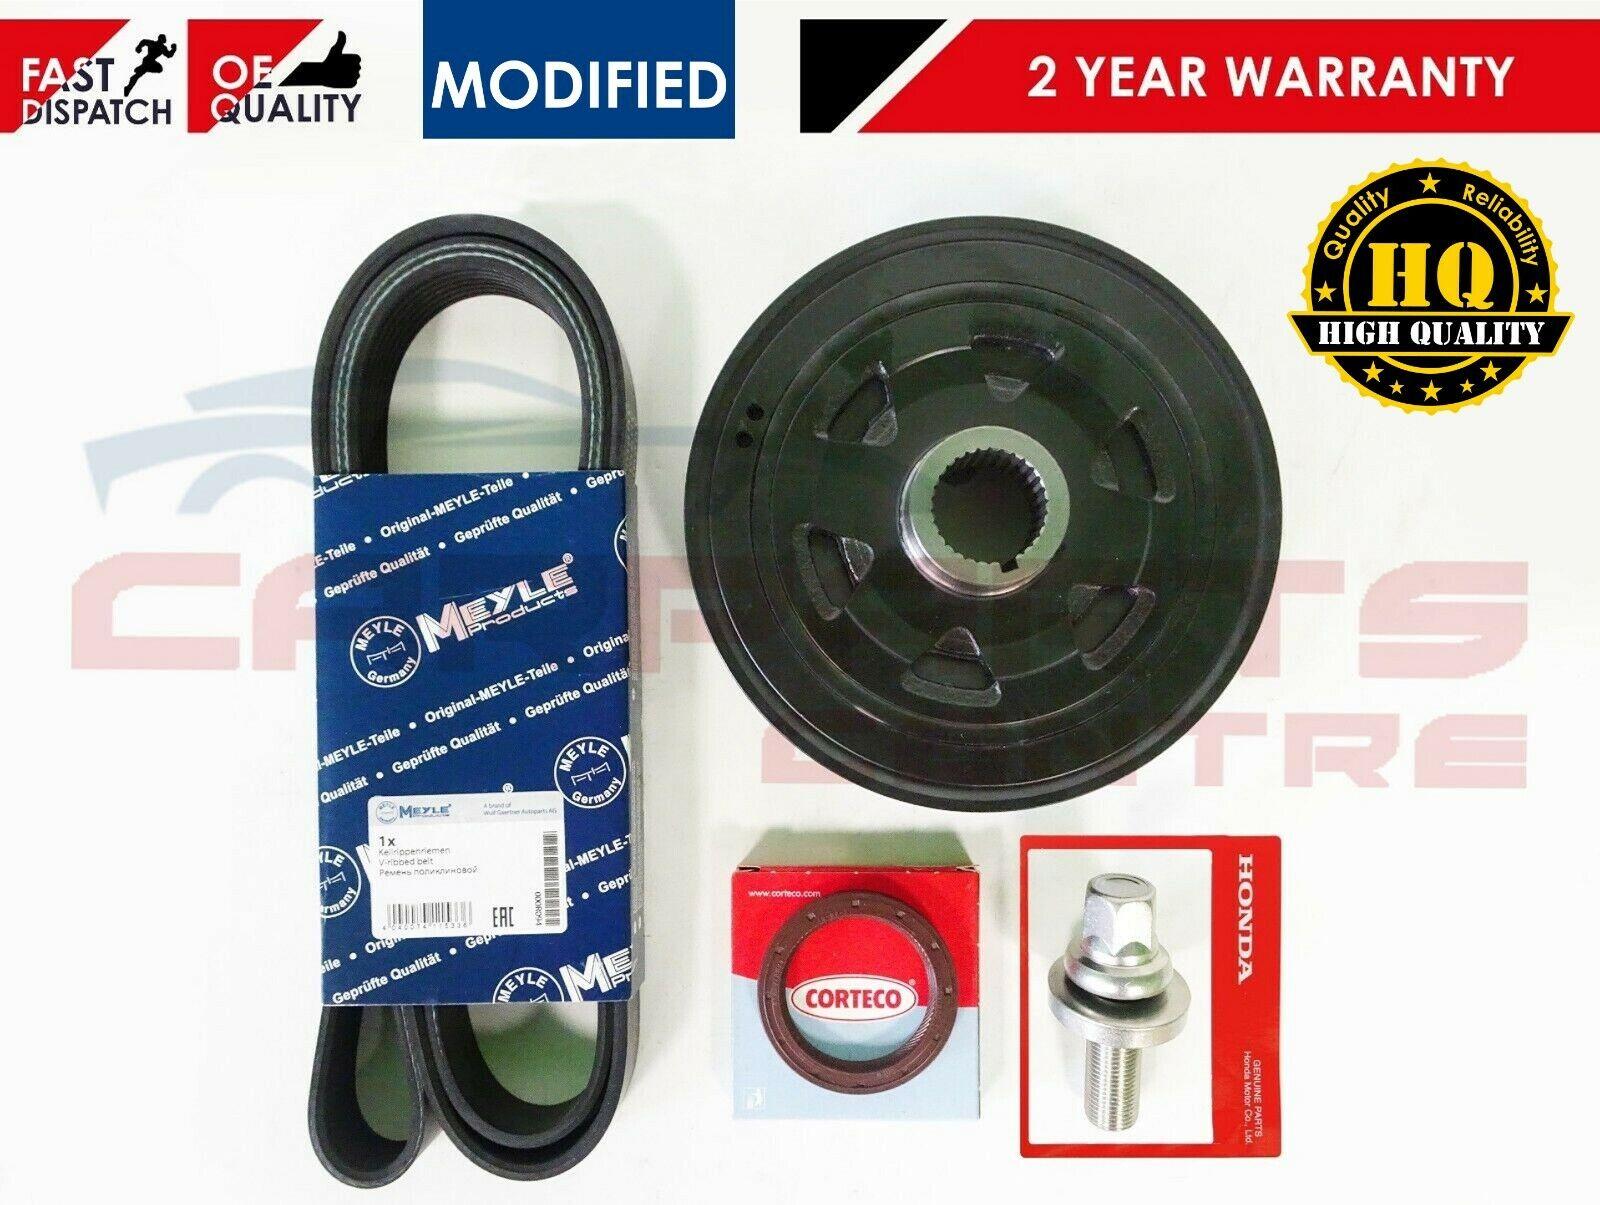 Honda Accord CRV FRV HRV 2.2 CDTI Crankshaft crank shaft damper Poulie Seal